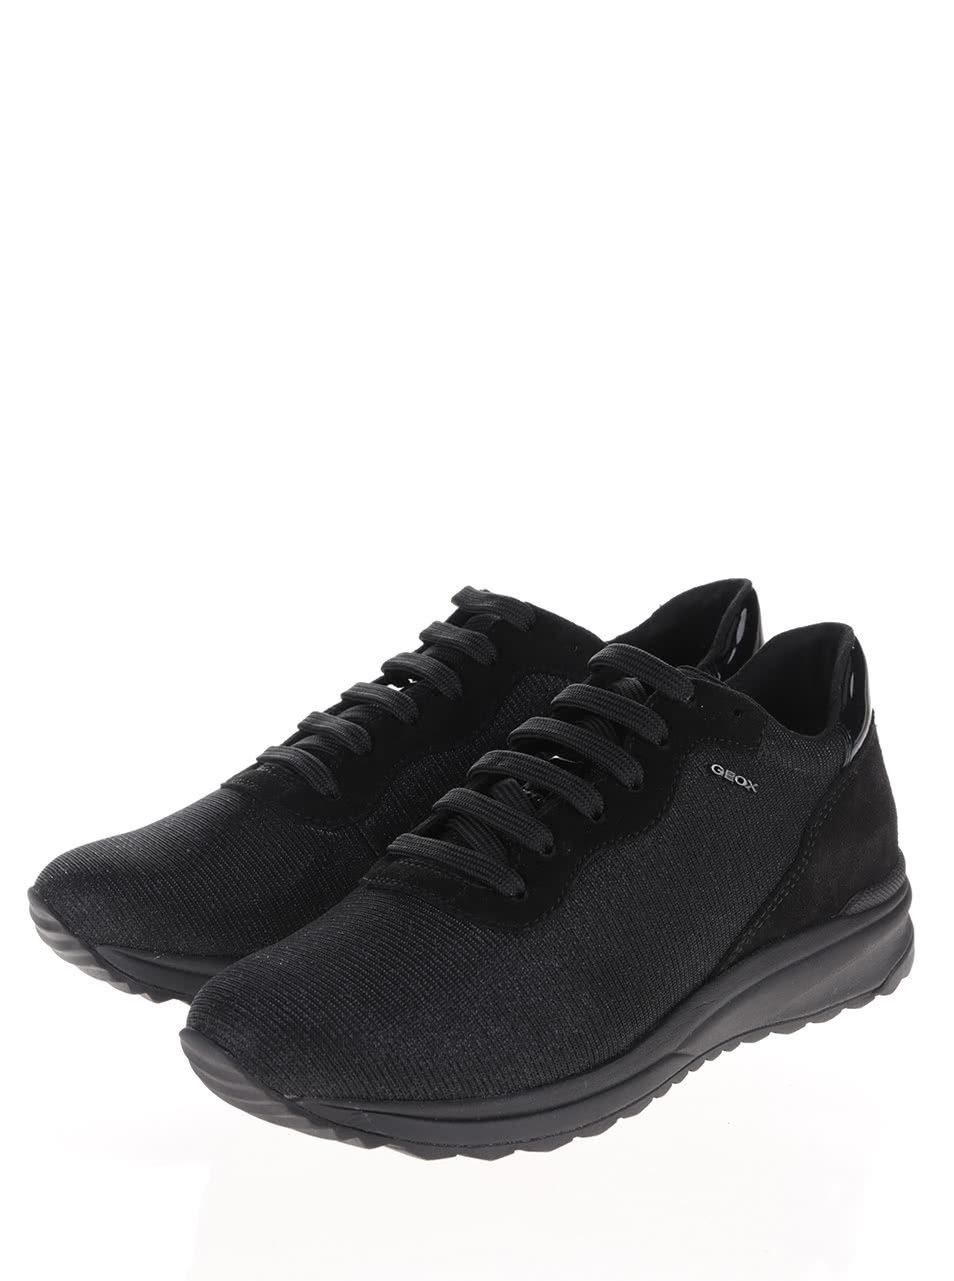 5a0ead73a54f Čierne dámske trblietavé tenisky s čiernou podrážkou Geox Airell B ...